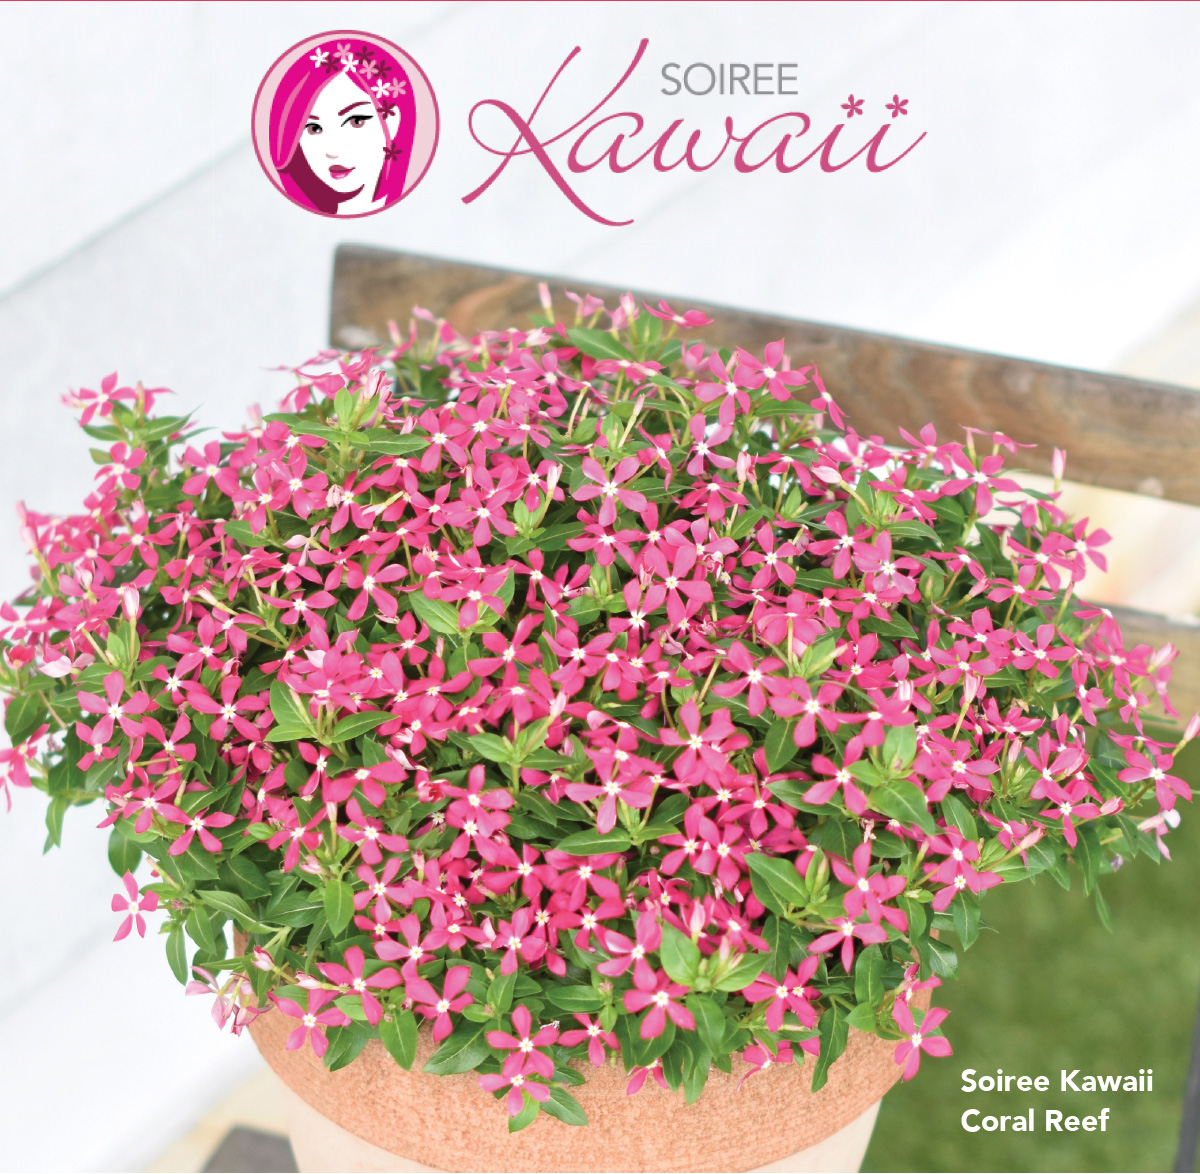 Suntory Soiree Kawaii CORAL REEF